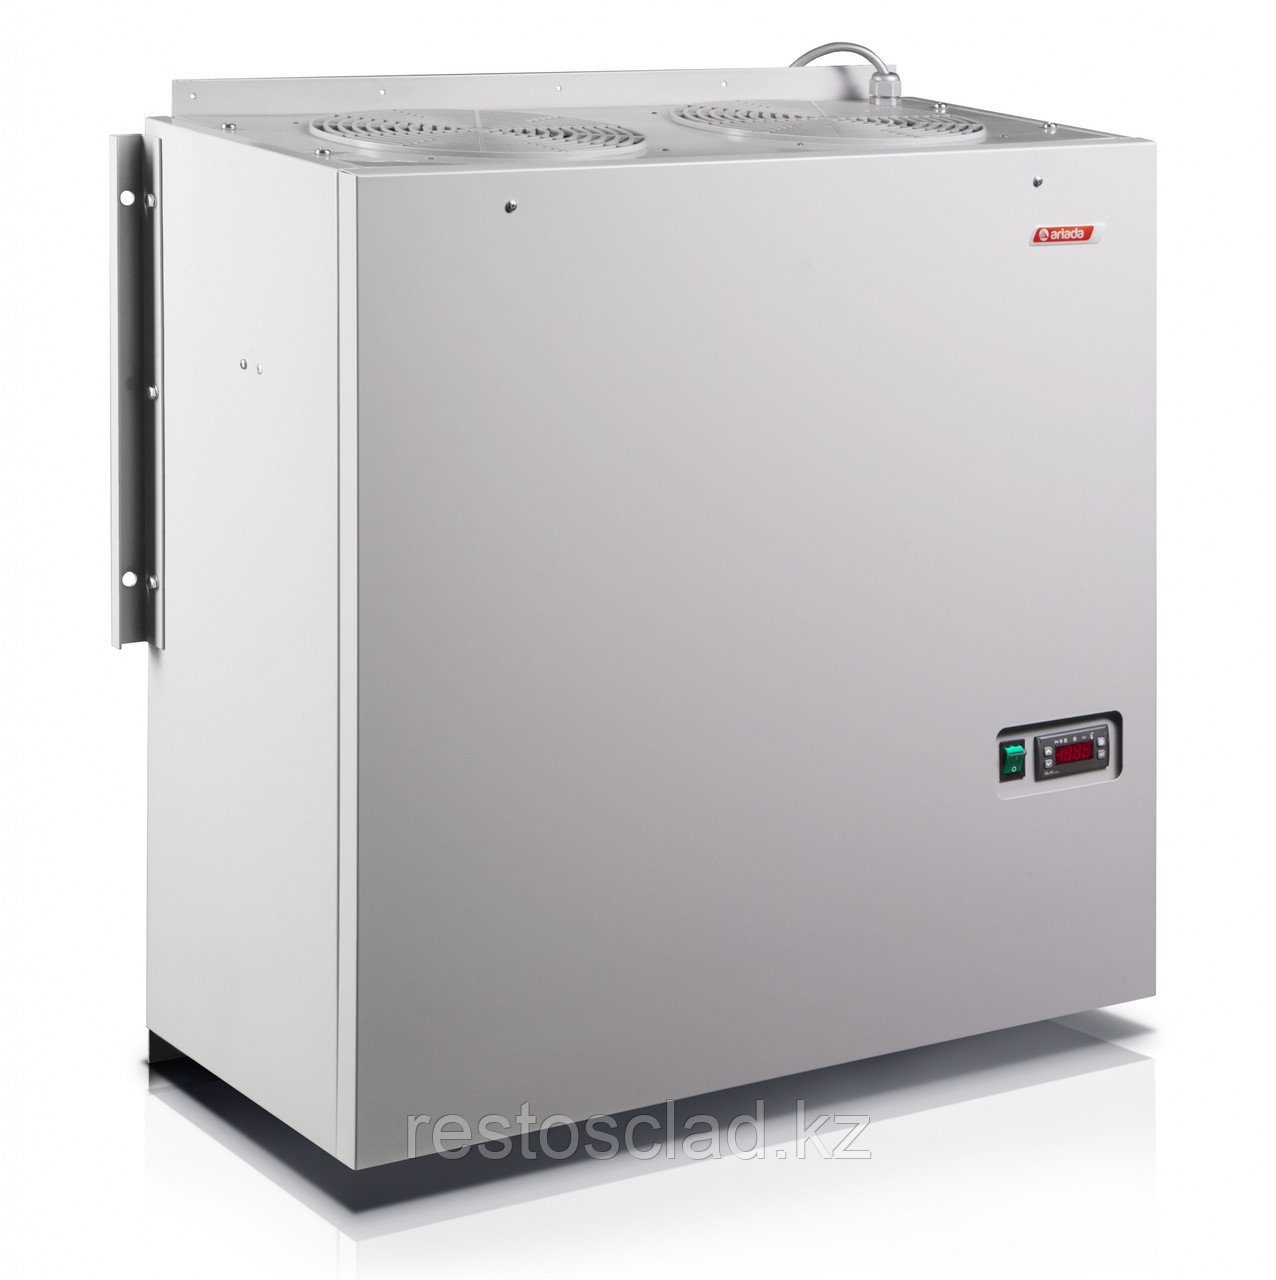 Сплит-система АРИАДА KMS-107